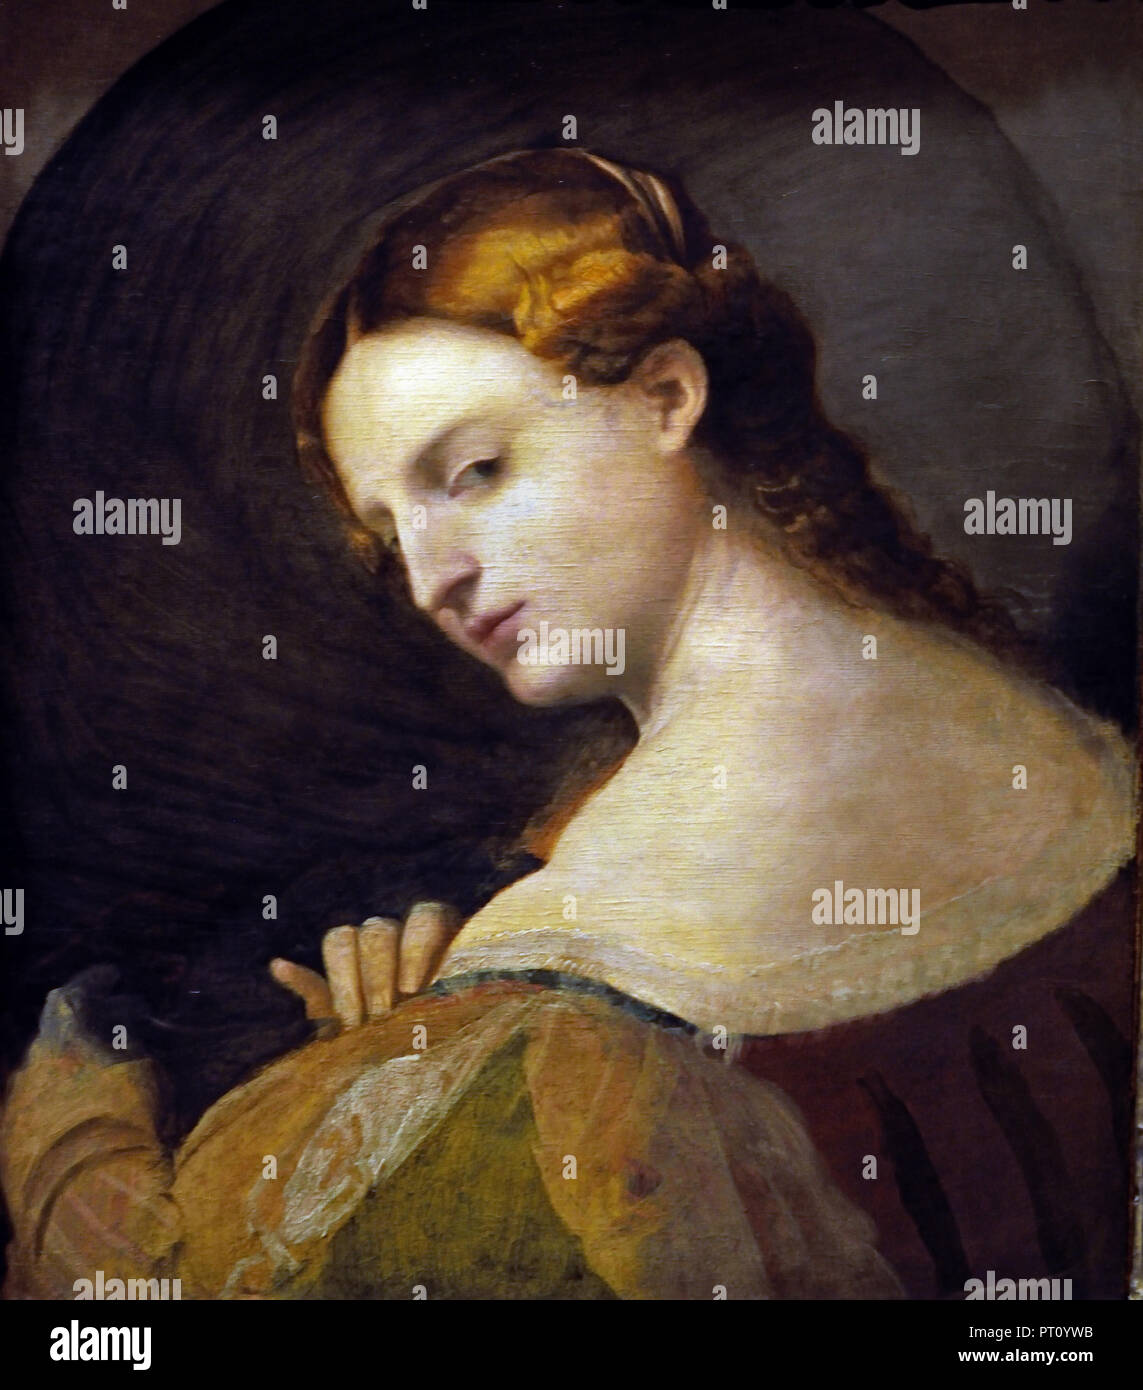 Junge Frau im Profil 1520 Palma Vecchio (1480-1528) Maler des 15. Jahrhunderts Venedig Italien Stockbild